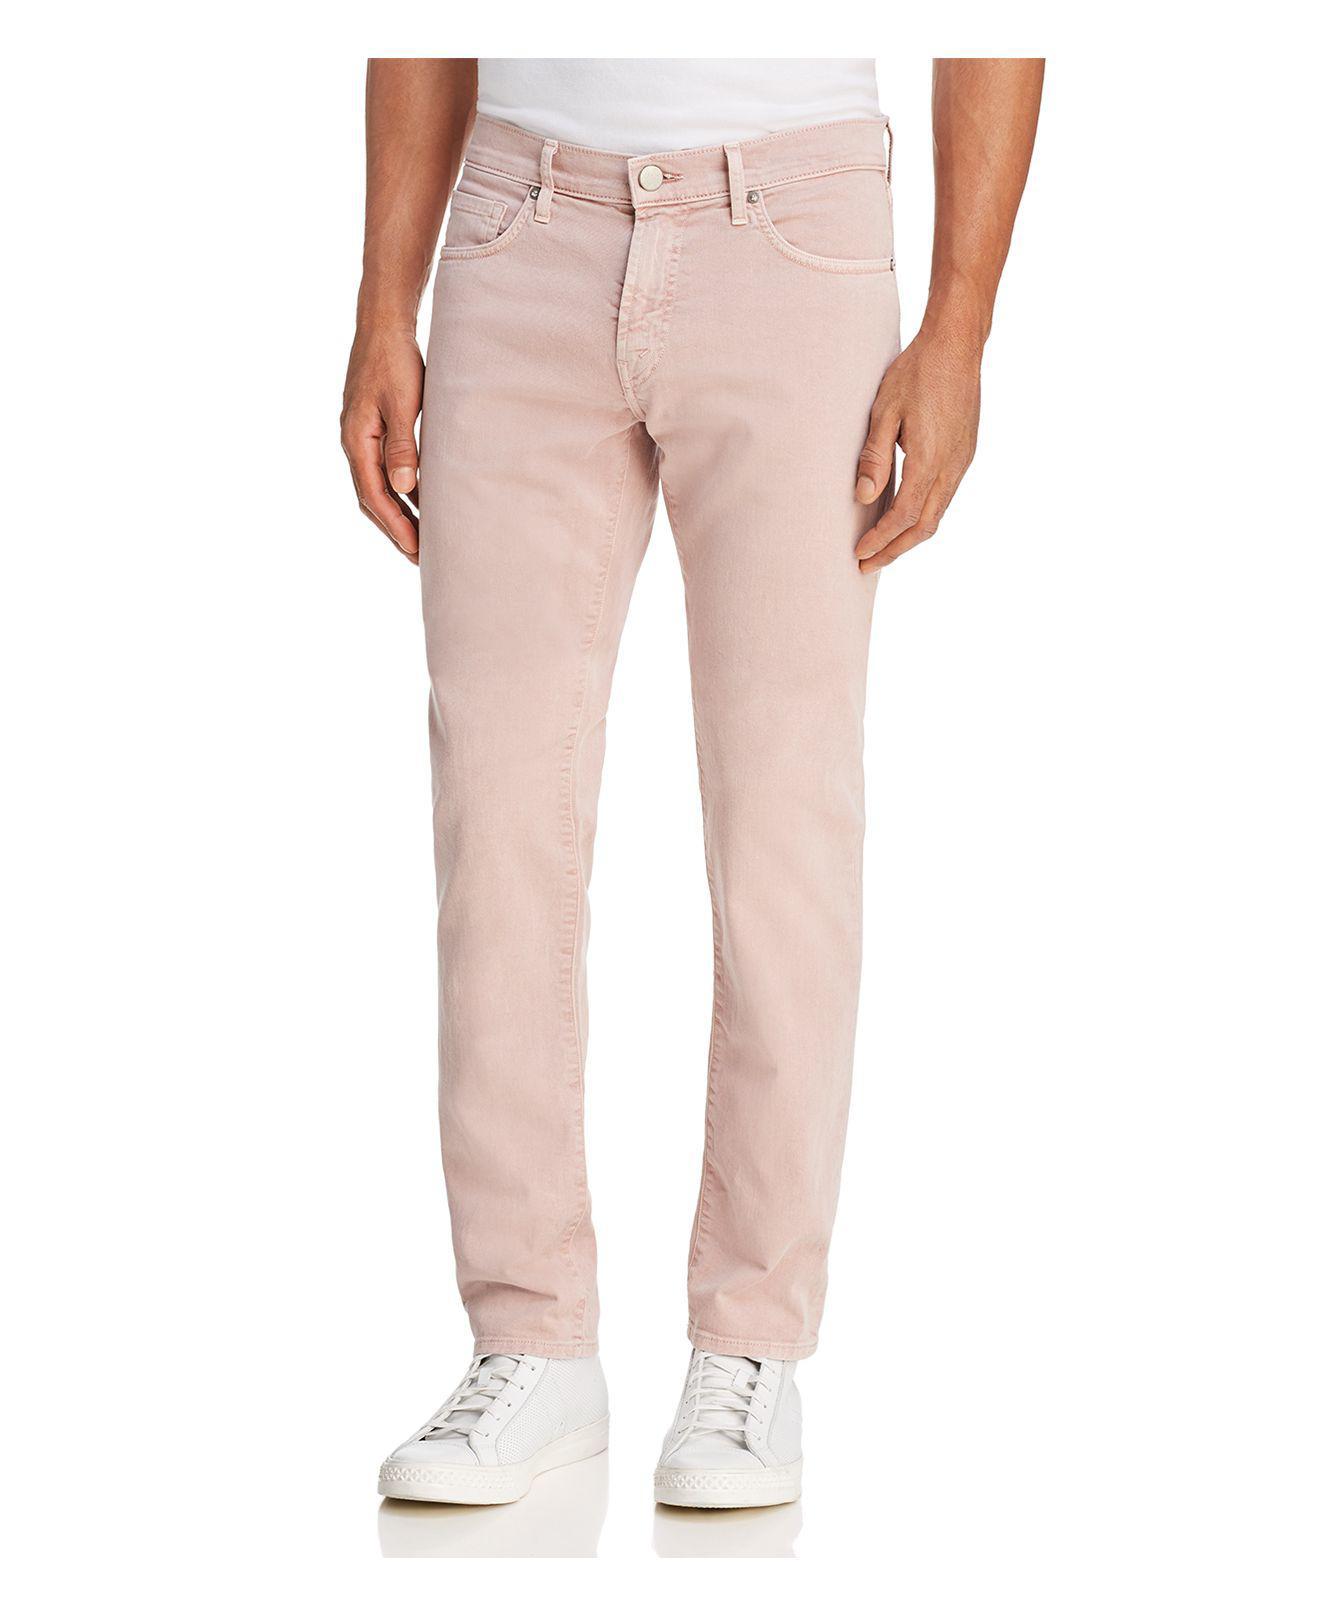 Tyler fit jeans - Pink & Purple J Brand KK8NZ5b